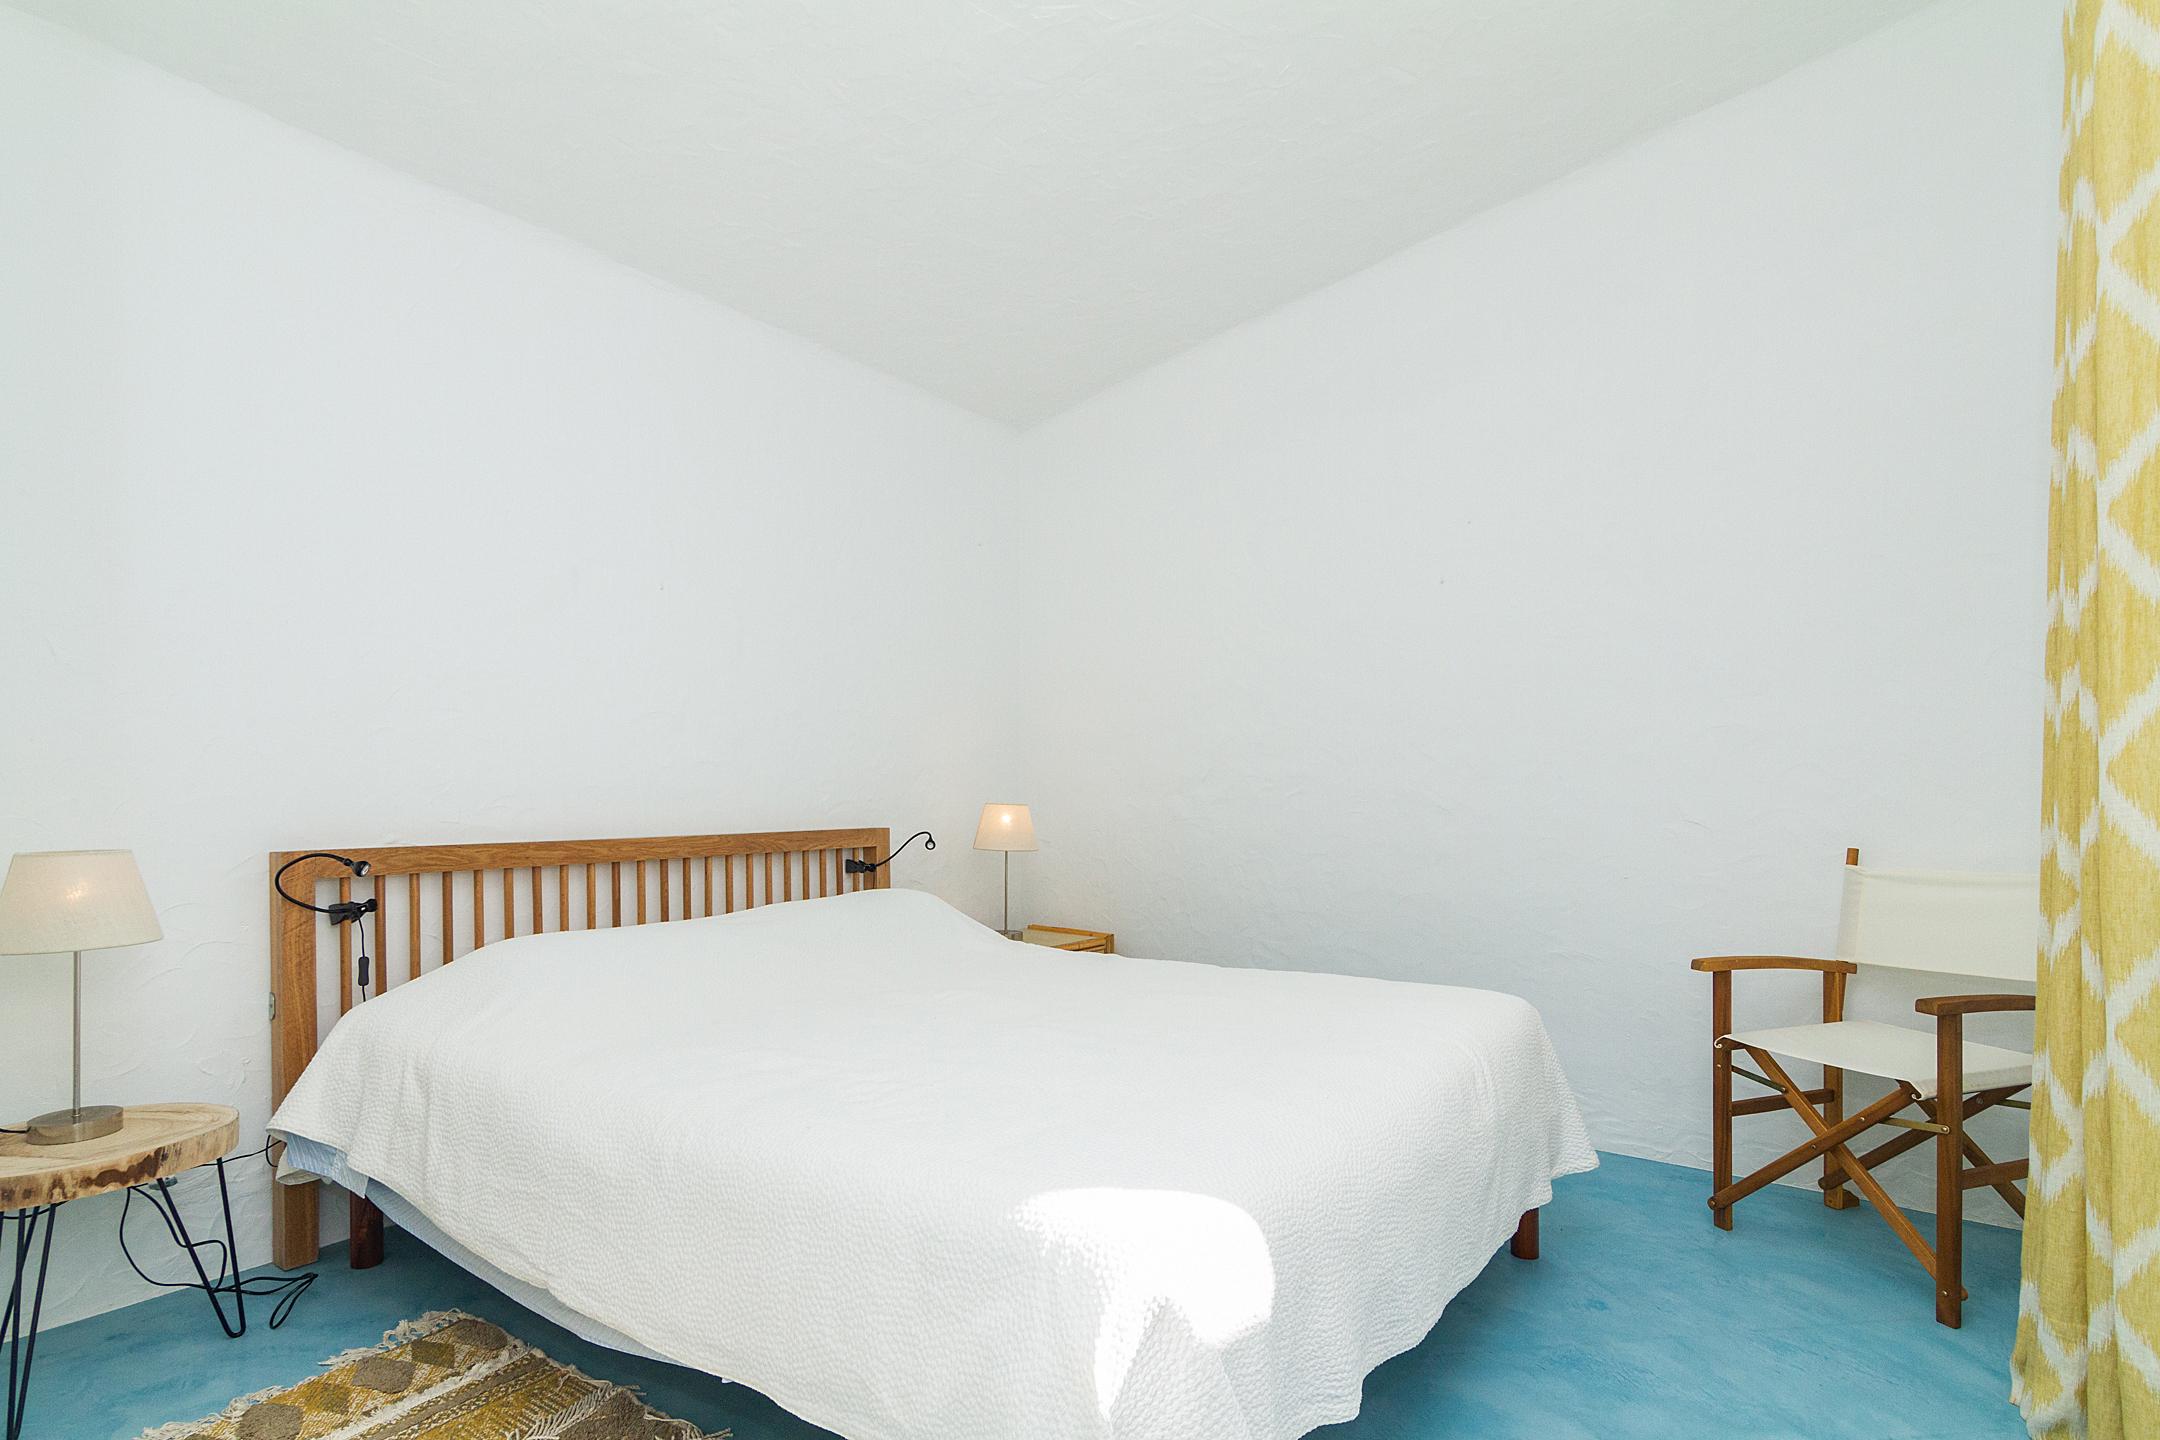 Location appartements et villas de vacance, Liiiving in Algarve | Alvor Blue Villa à Alvor, Portugal Algarve, REF_IMG_14545_14560